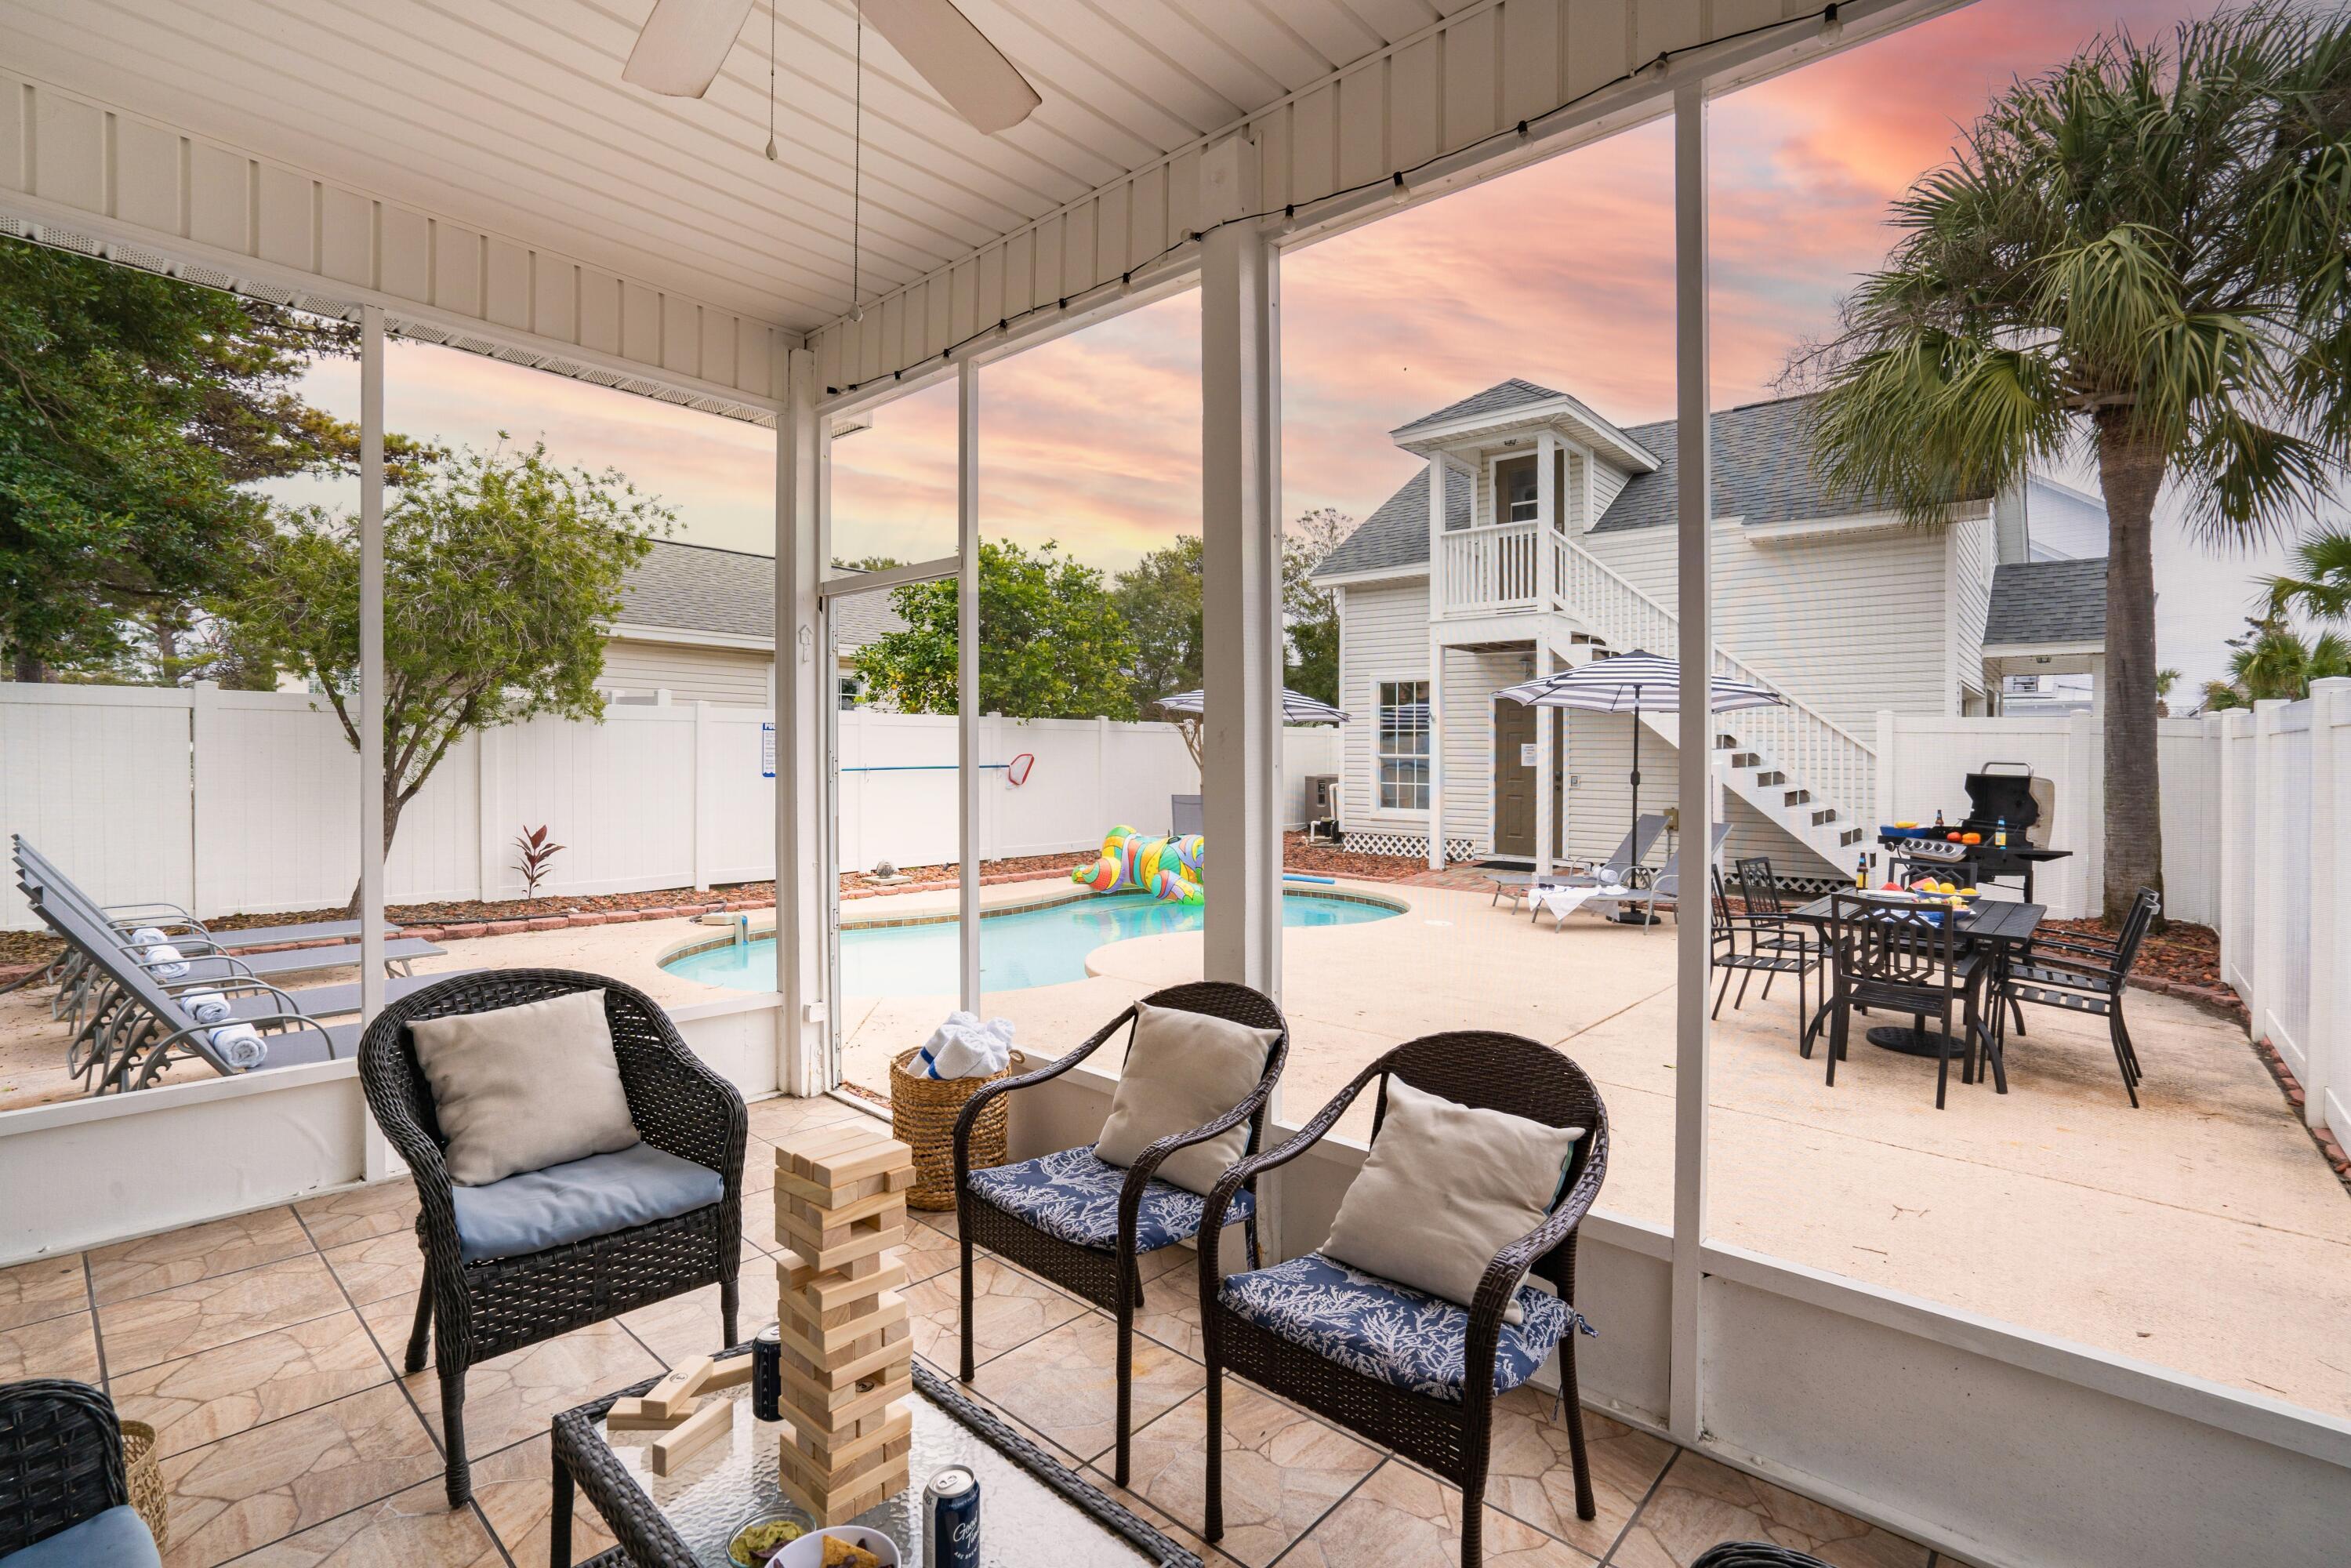 A 7 Bedroom 5 Bedroom Crystal Beach Home